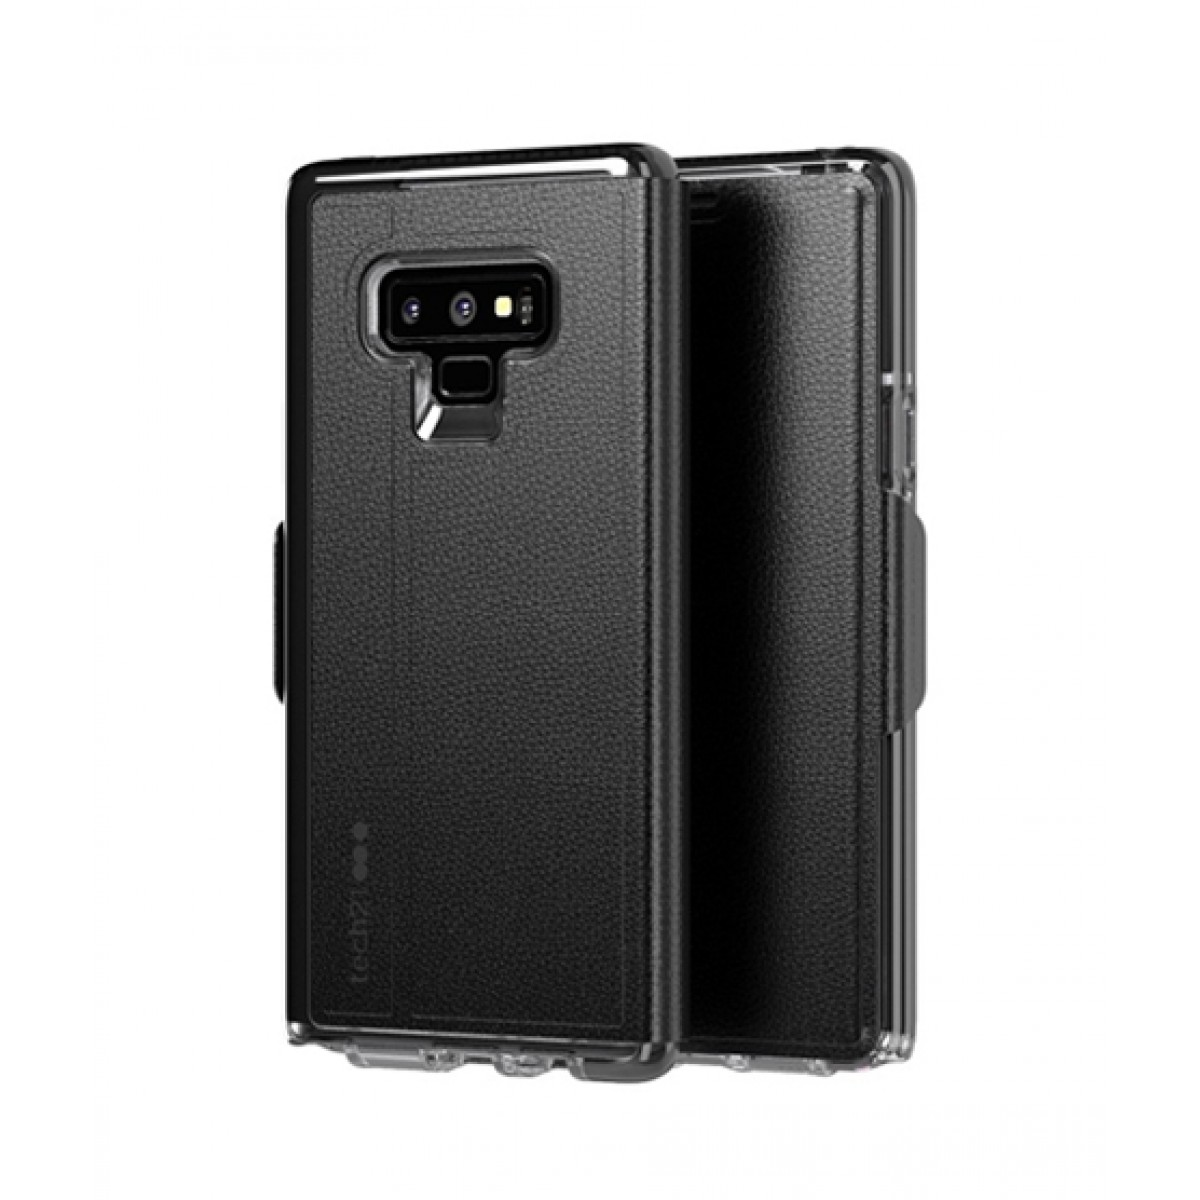 online retailer f62dd b4f38 Tech21 Evo Wallet Black Case For Galaxy Note 9